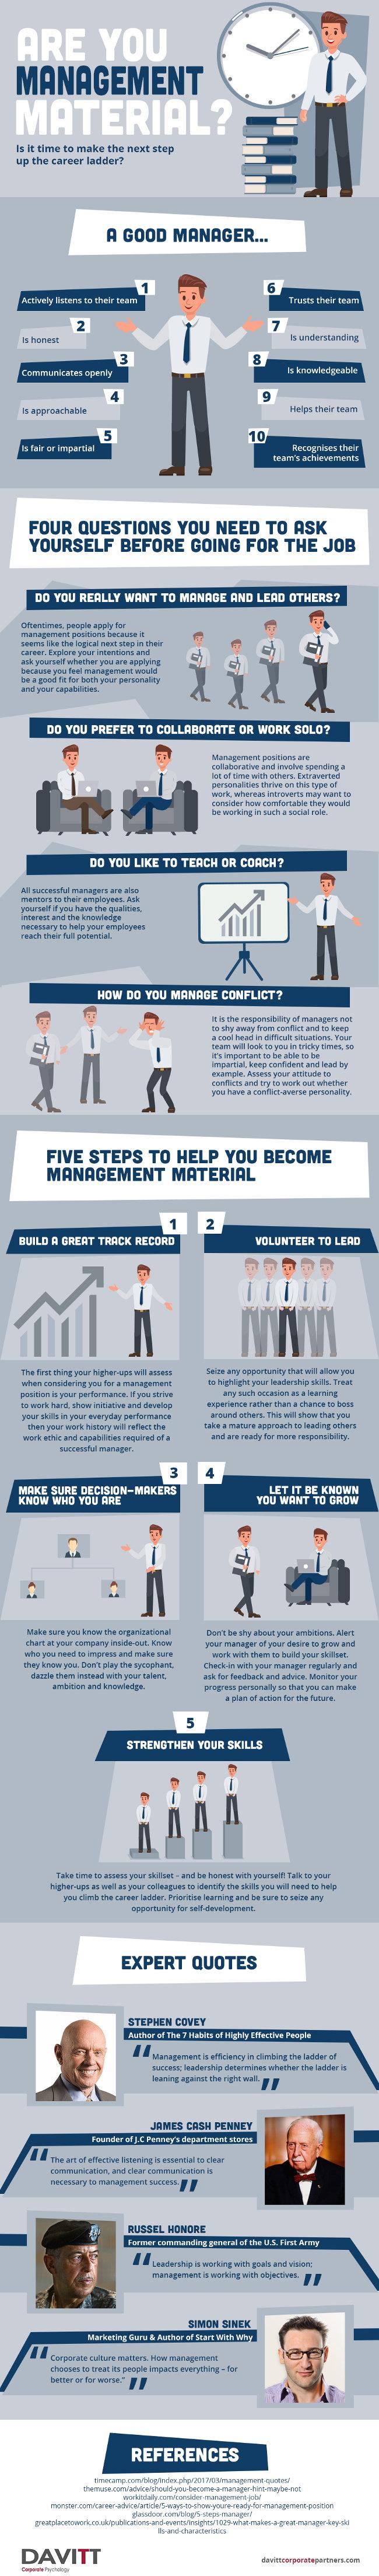 Davitt Corporate Partners provides practical tips on how to kickstart your management journey